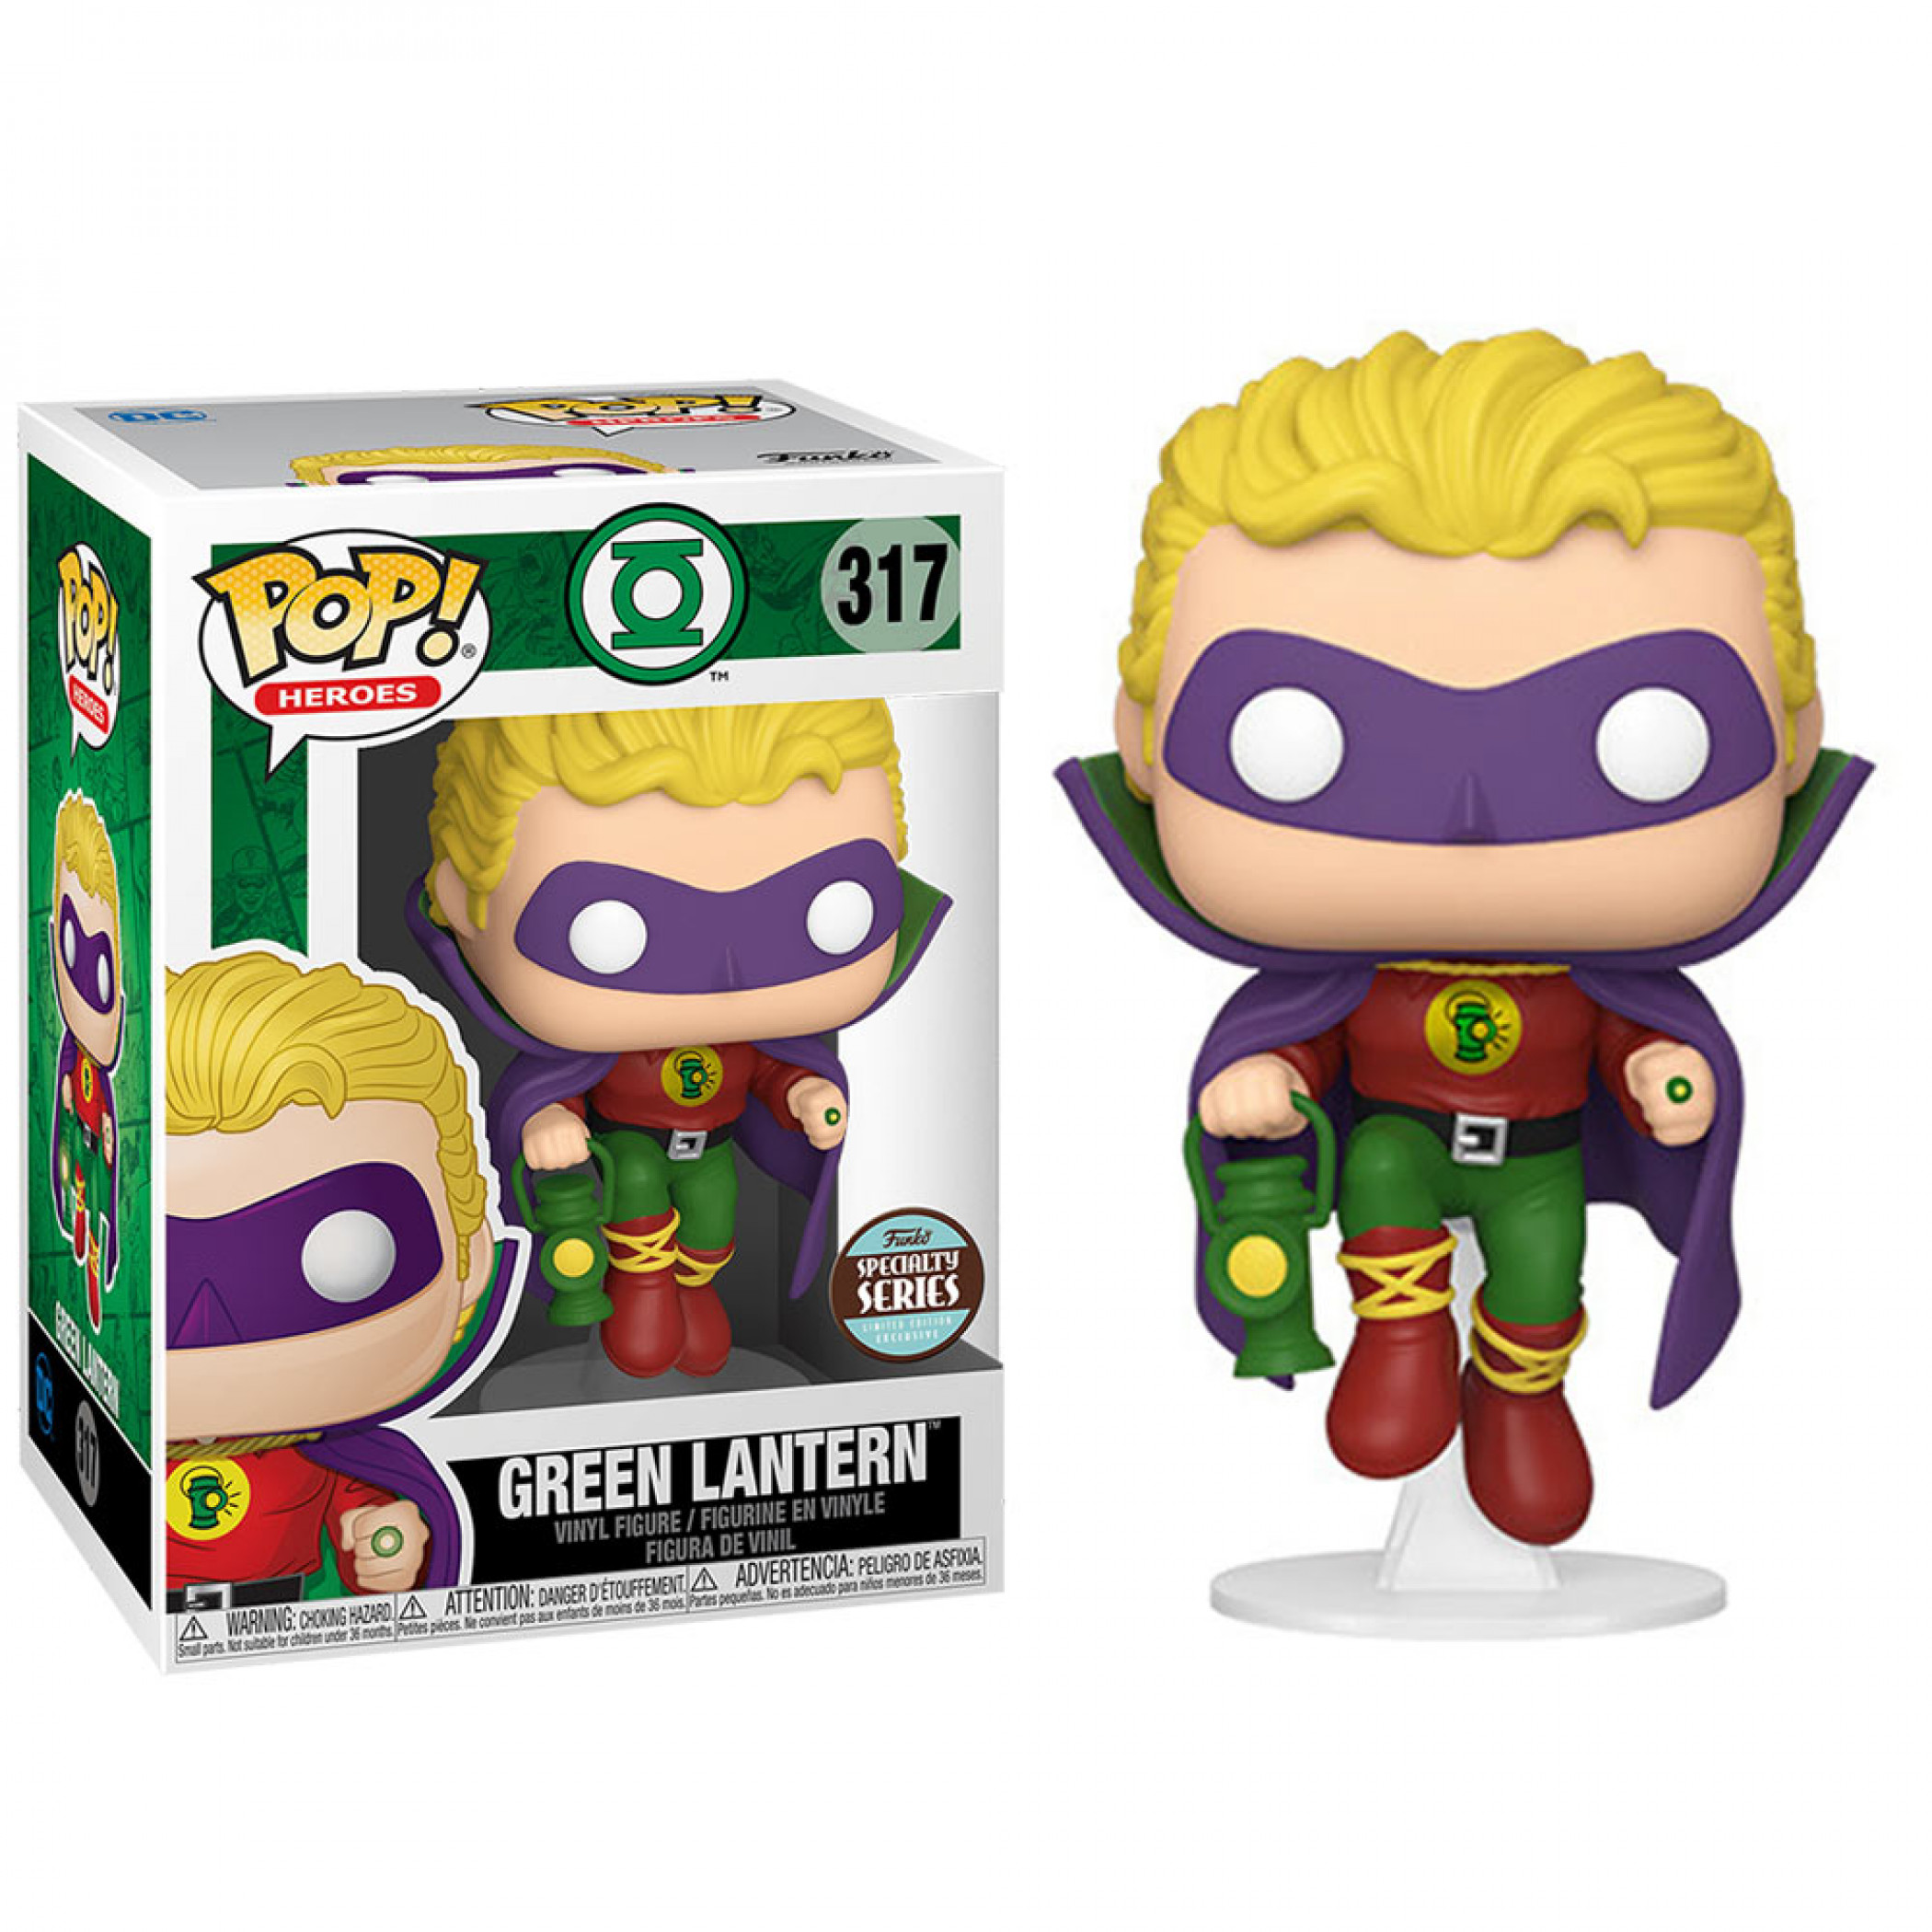 DC Comics Alan Scott as Green Lantern Specialty Series Funko Pop!